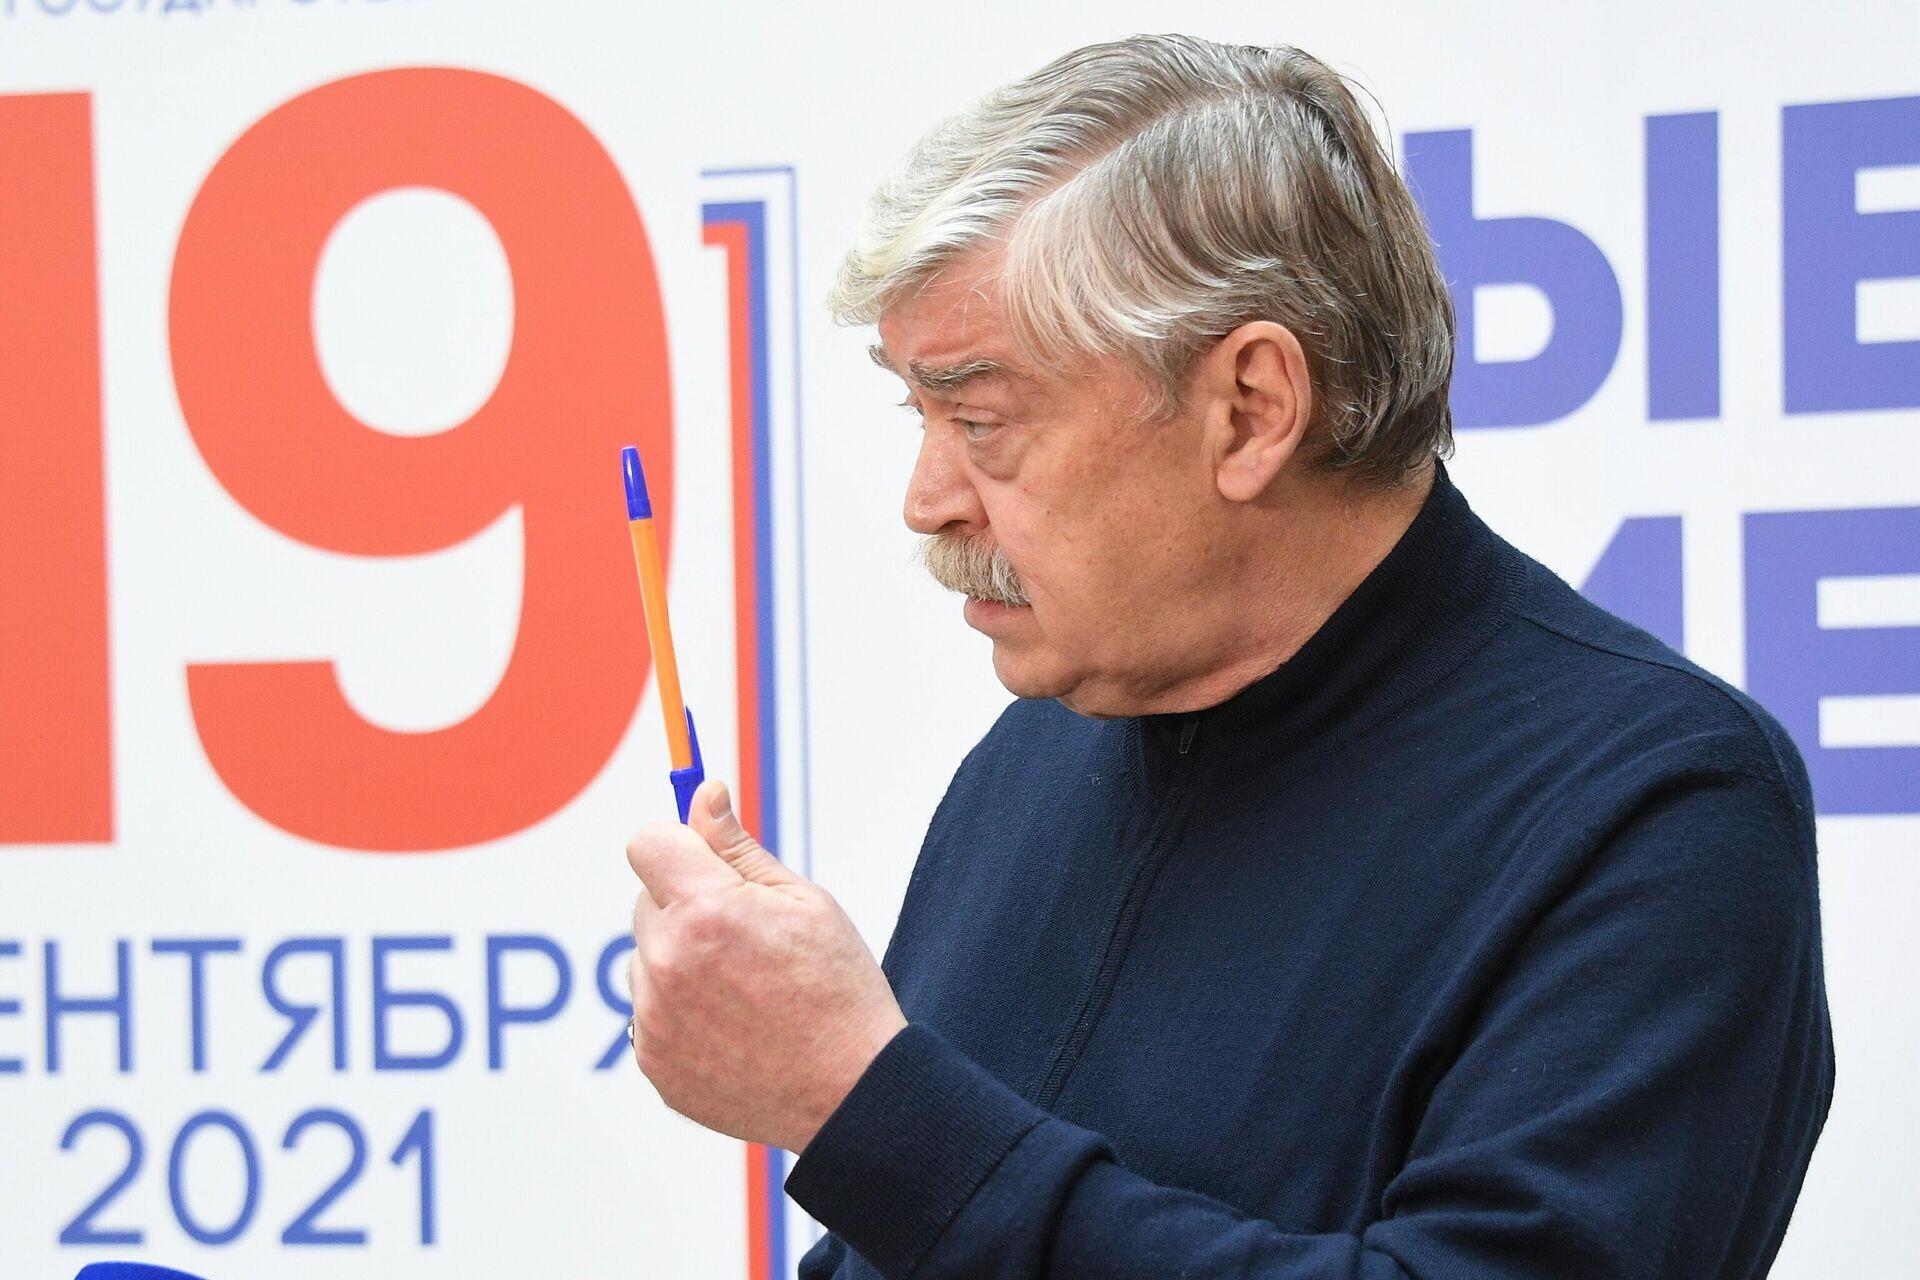 Посол РФ в Беларуси Евгений Лукьянов - Sputnik Беларусь, 1920, 19.09.2021